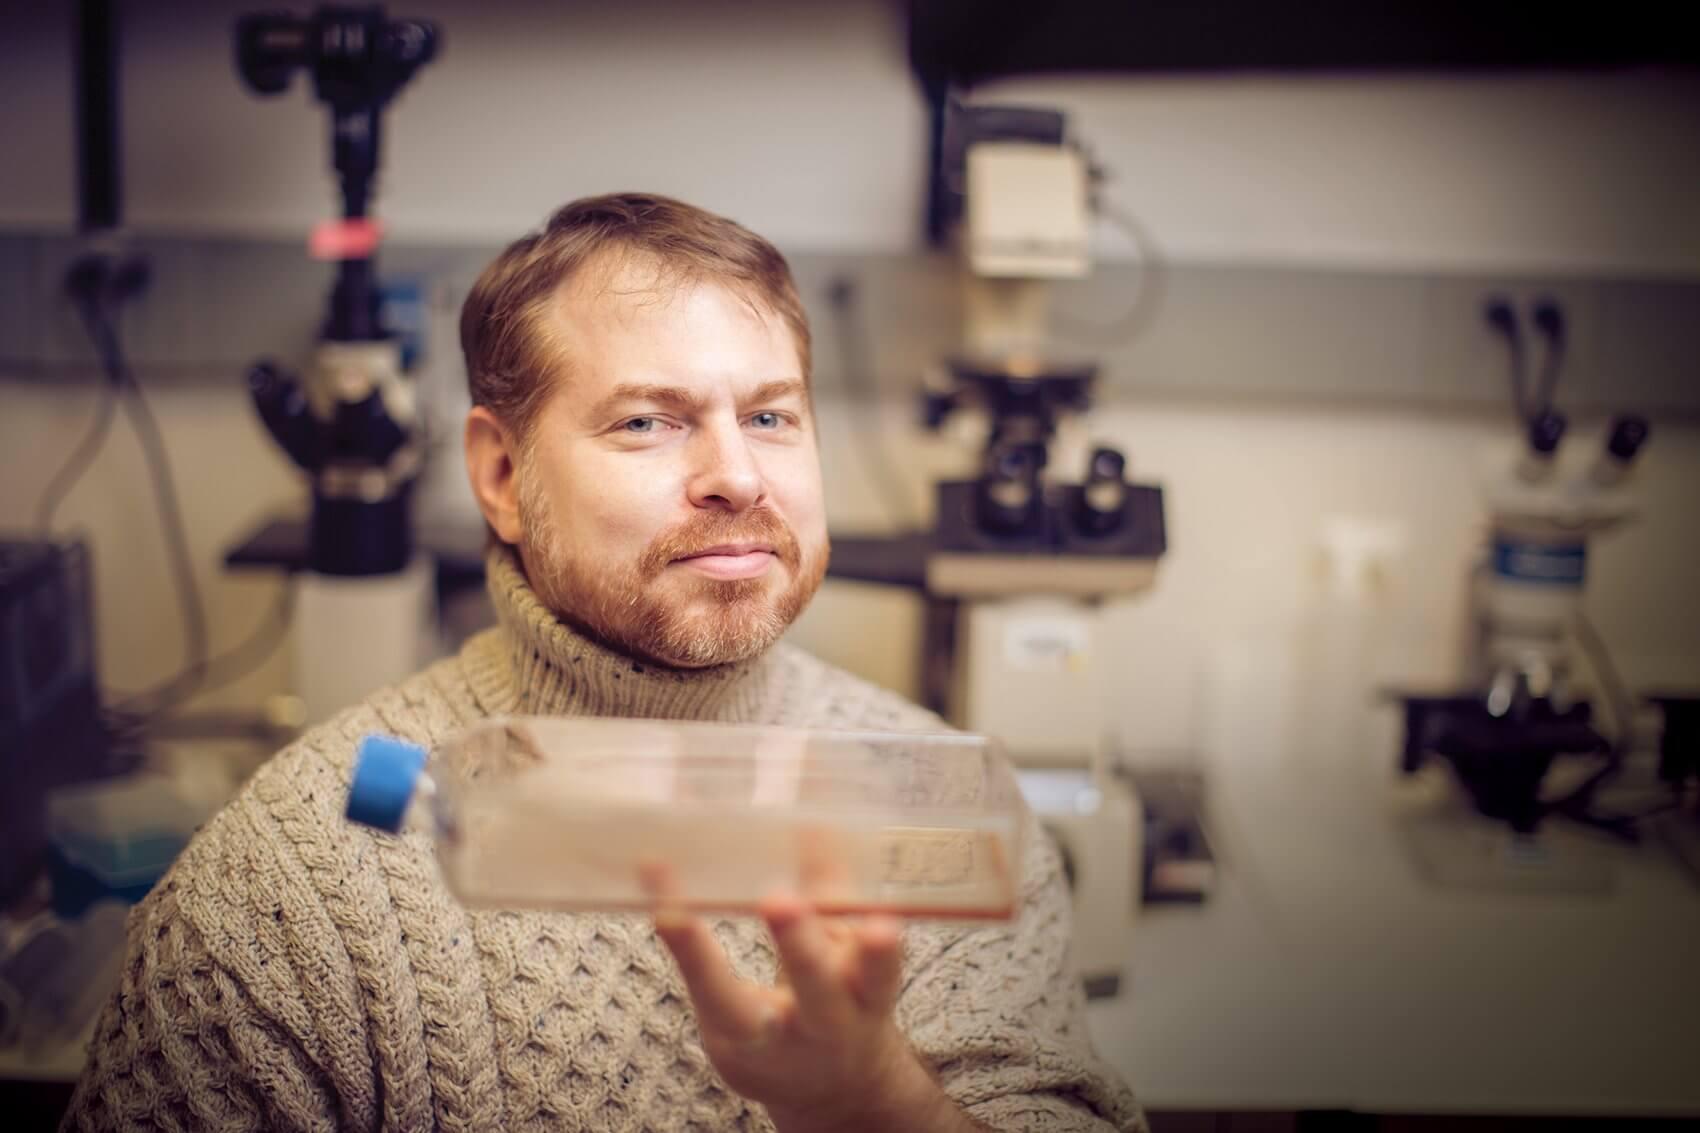 William K. Decker, Ph.D., assistant professor of immunology at Baylor College of Medicine